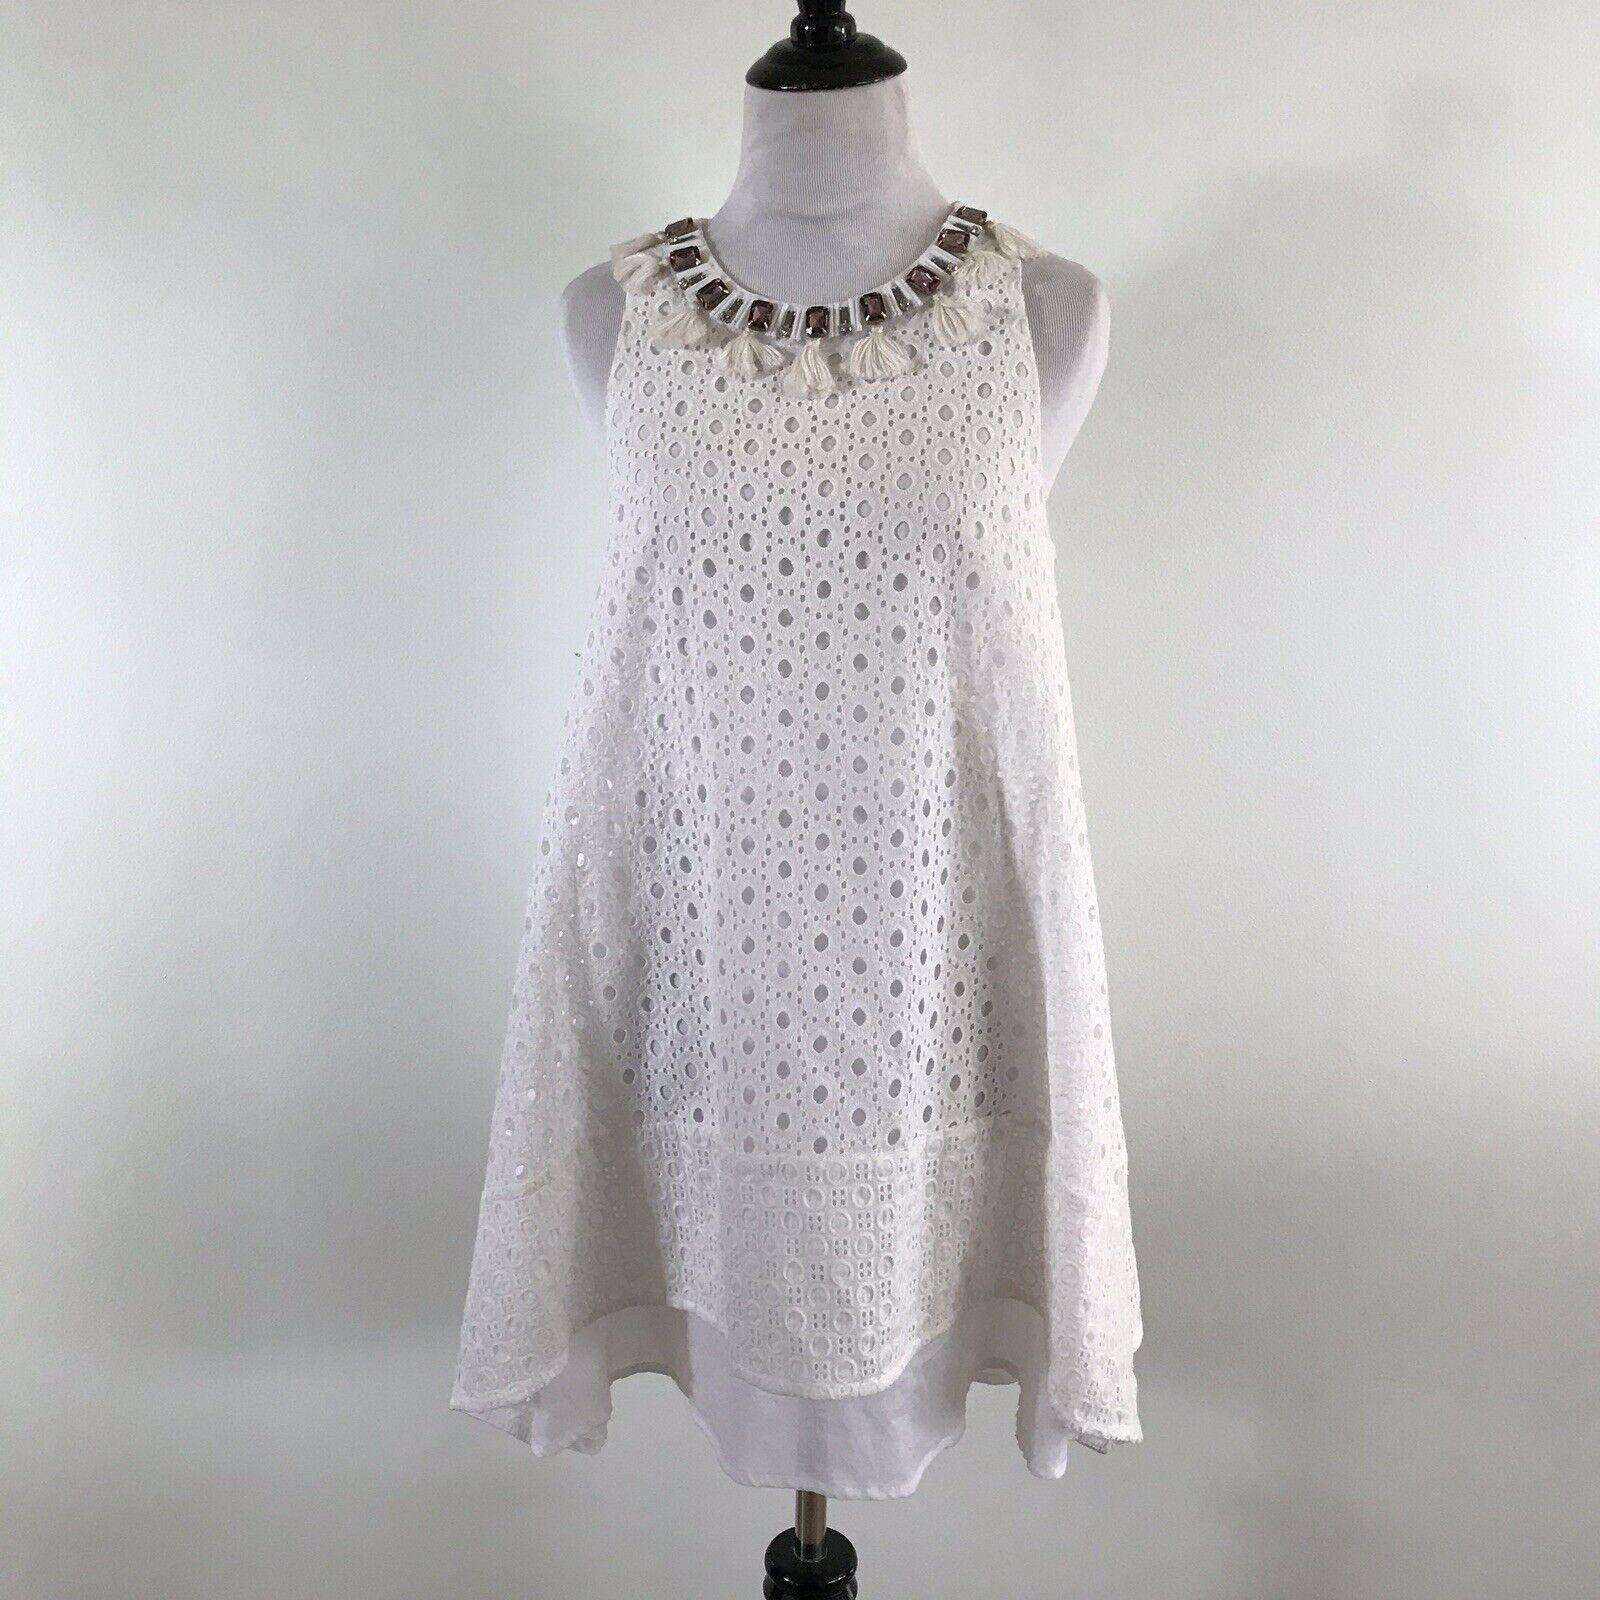 Rosao Weiß Eyelet Lace Dress Sleeveless Embellished Neckline Größe 8